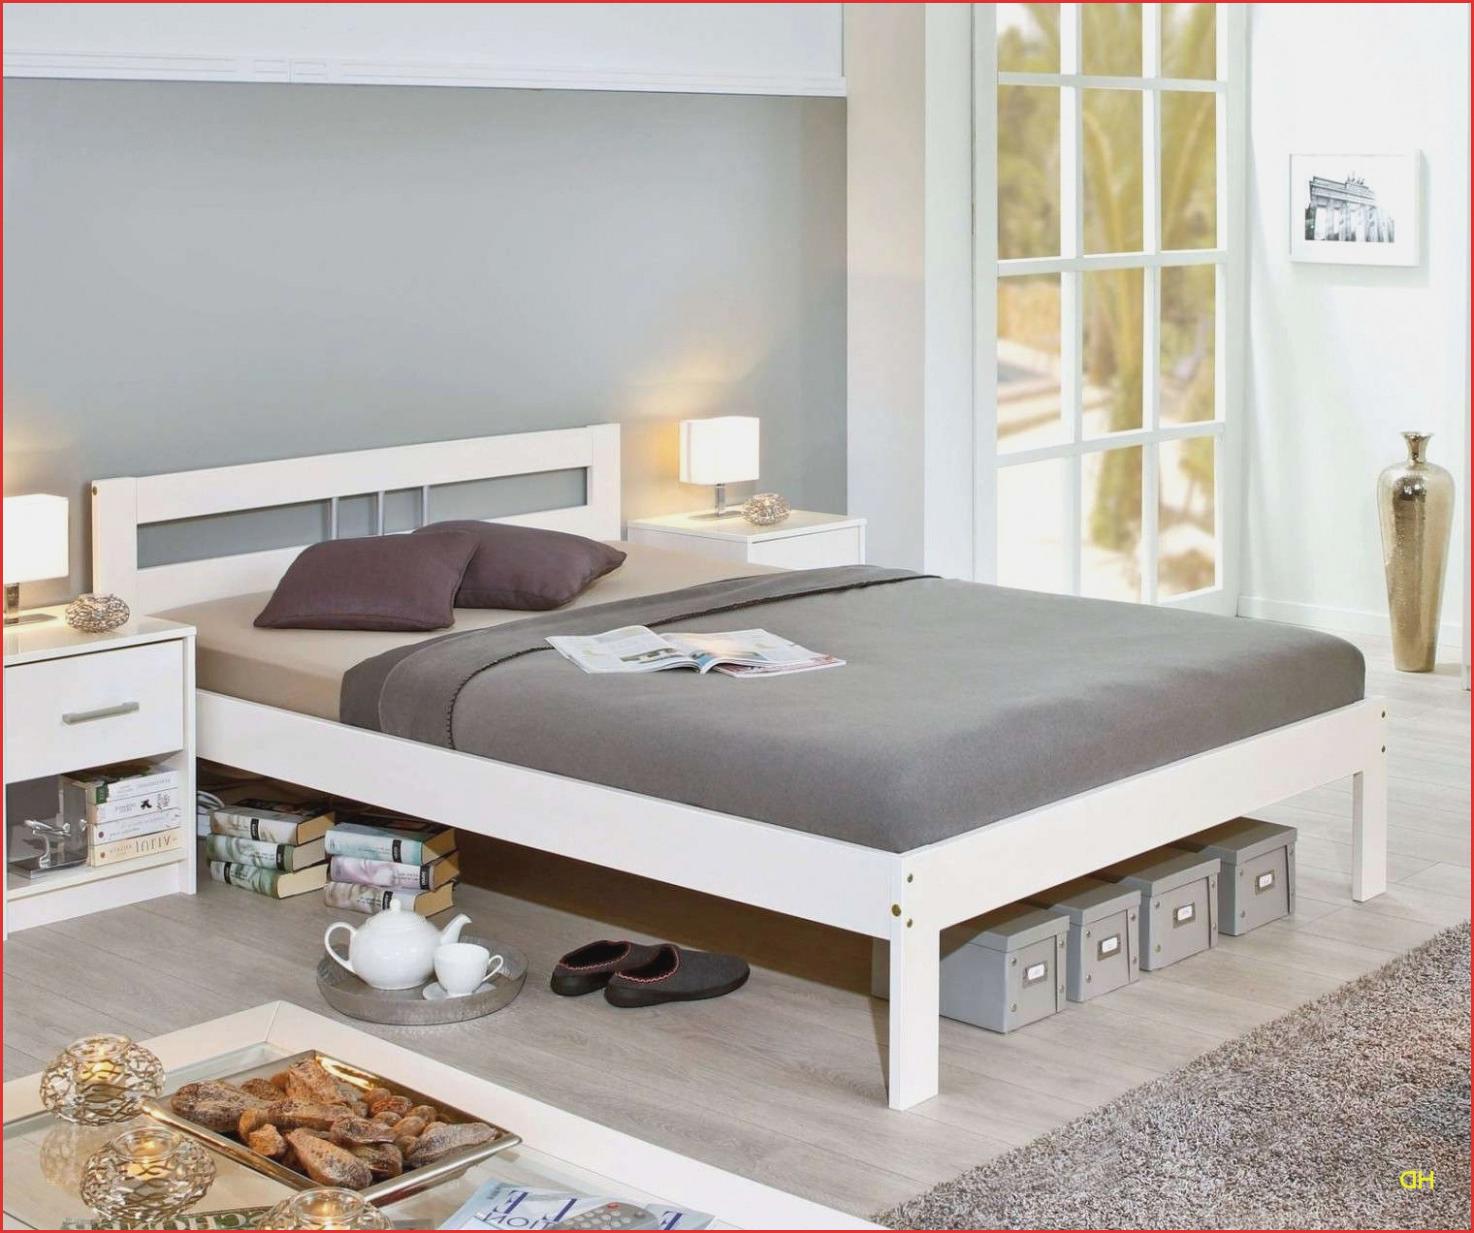 Full Size of Schrankbett 180x200 Amazon Bett Mit Schrankwand Jugend Bett/schrank Kombination Schrank 160x200 Kombi Gebraucht Sofa Ikea 140x200 Minimalistisch Musterring Bett Bett Schrank